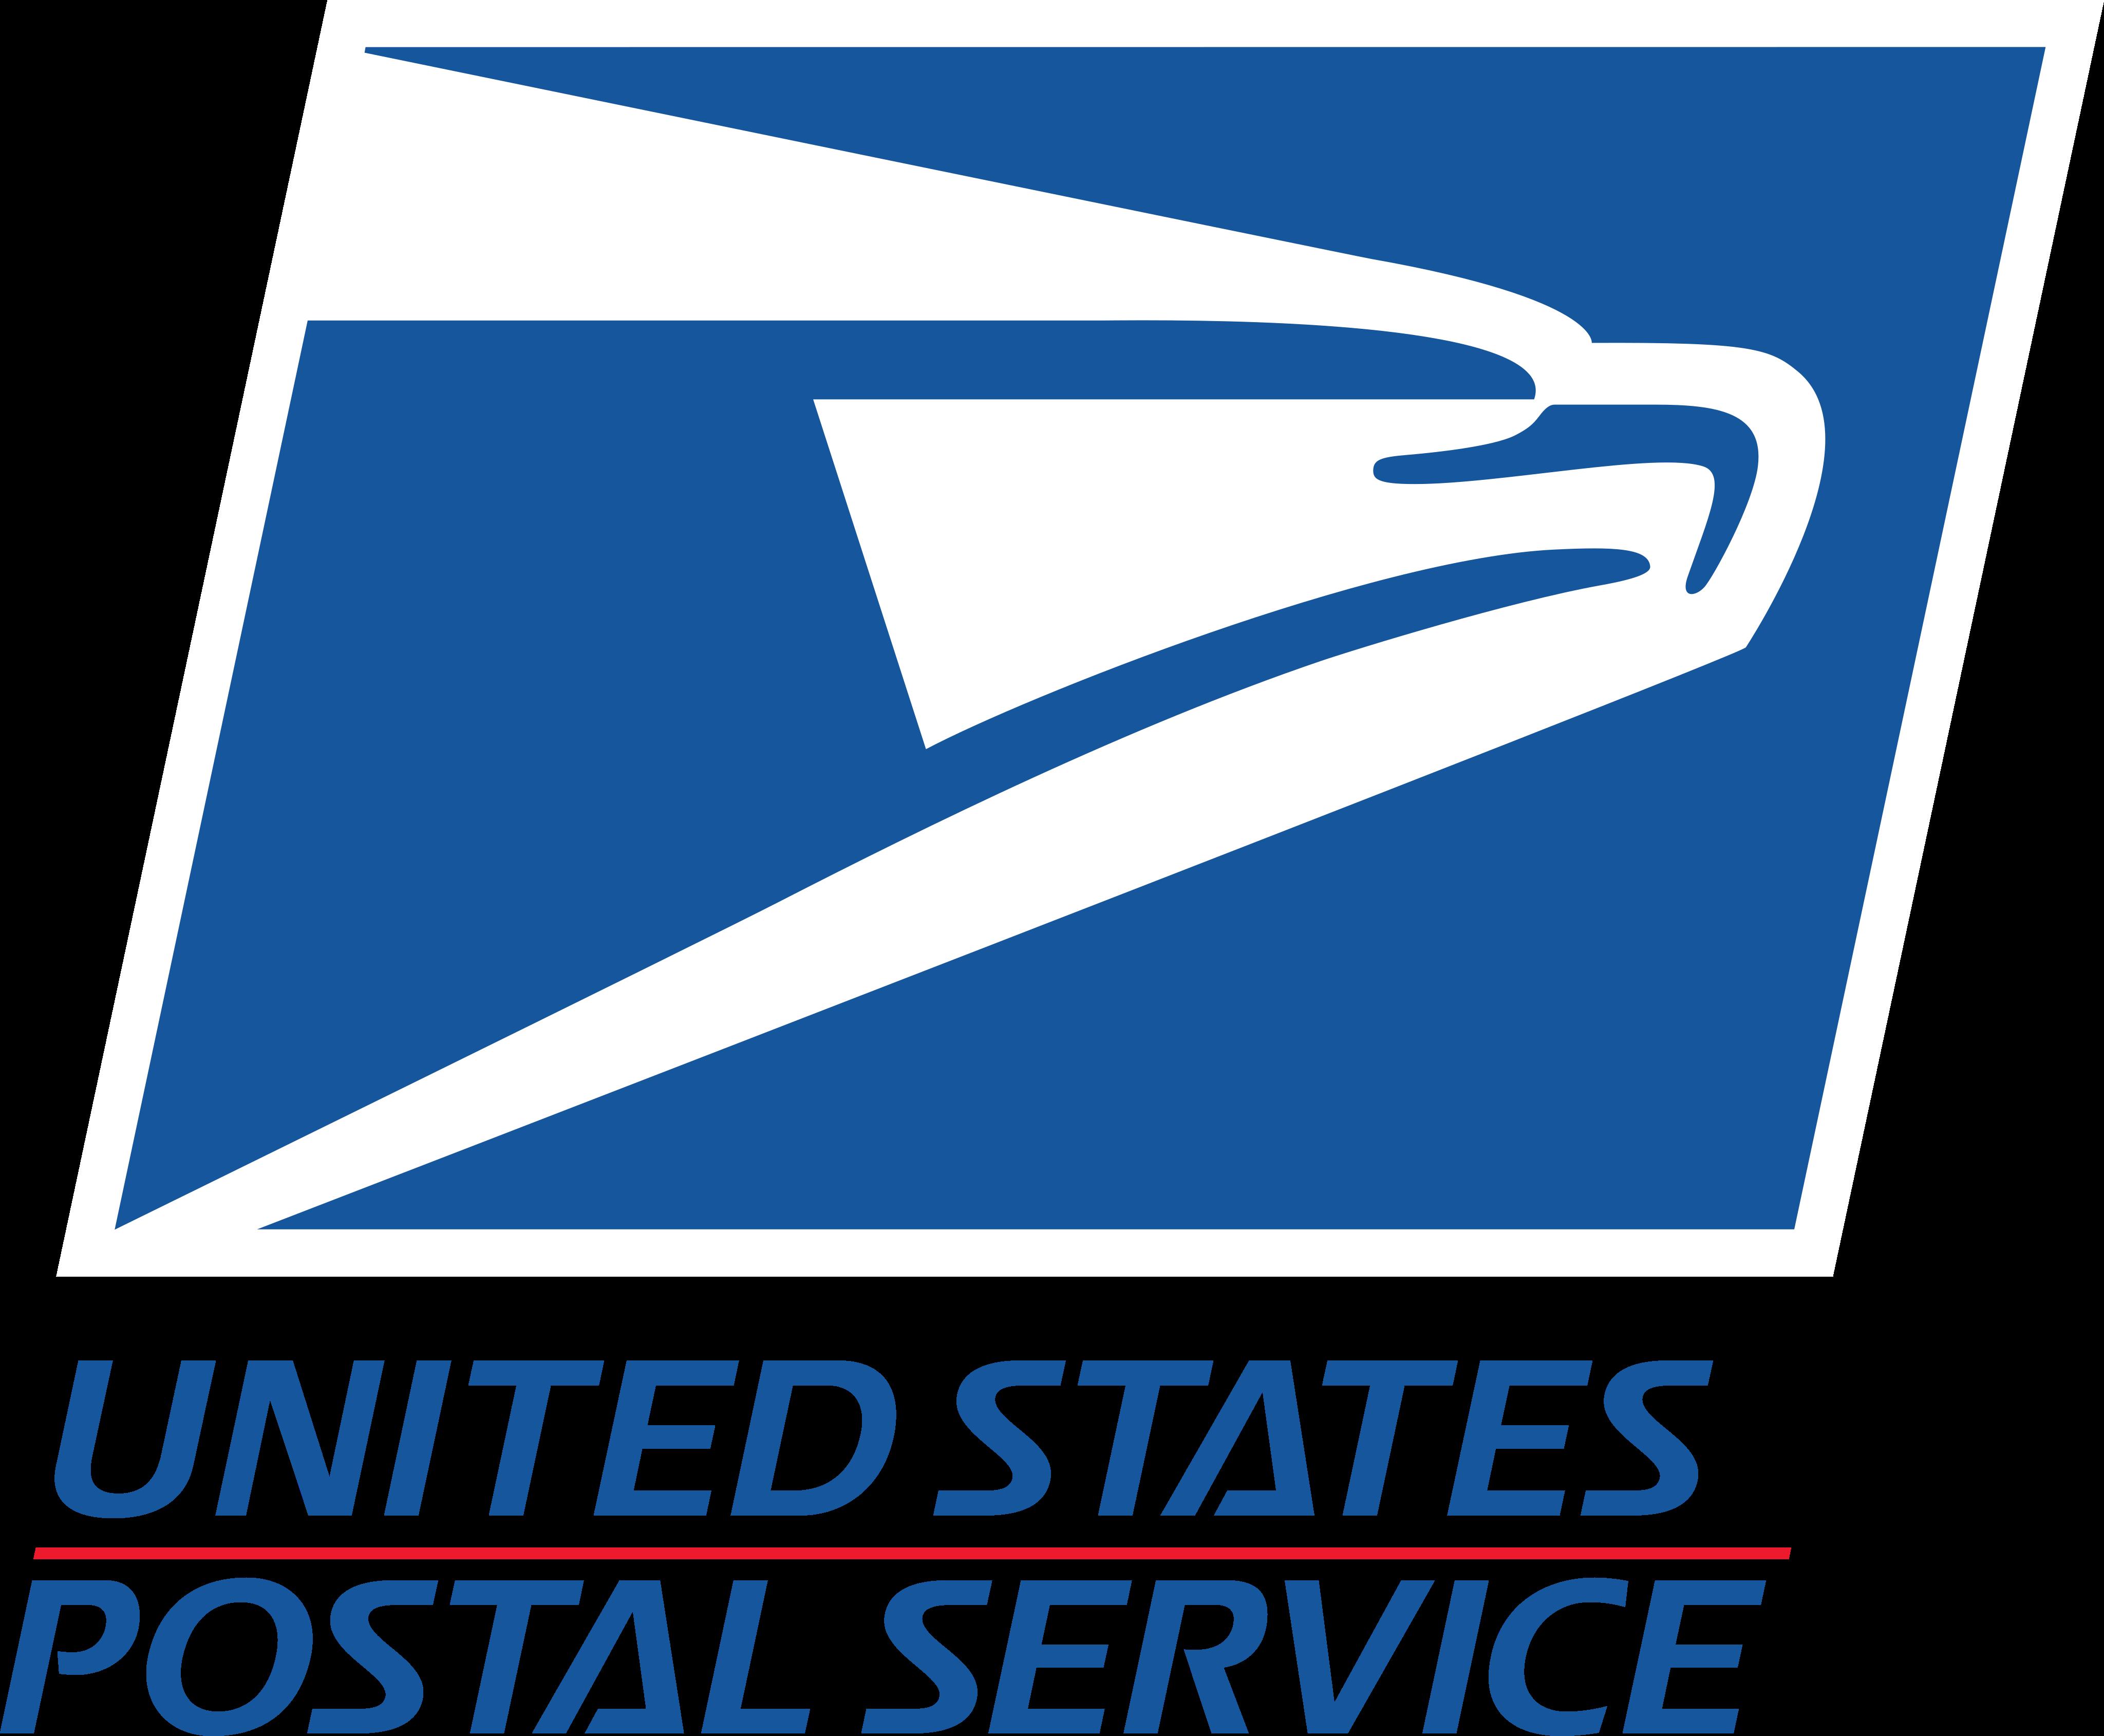 united states postal service usps logo 1 - USPS Logo - United States Postal Service Logo